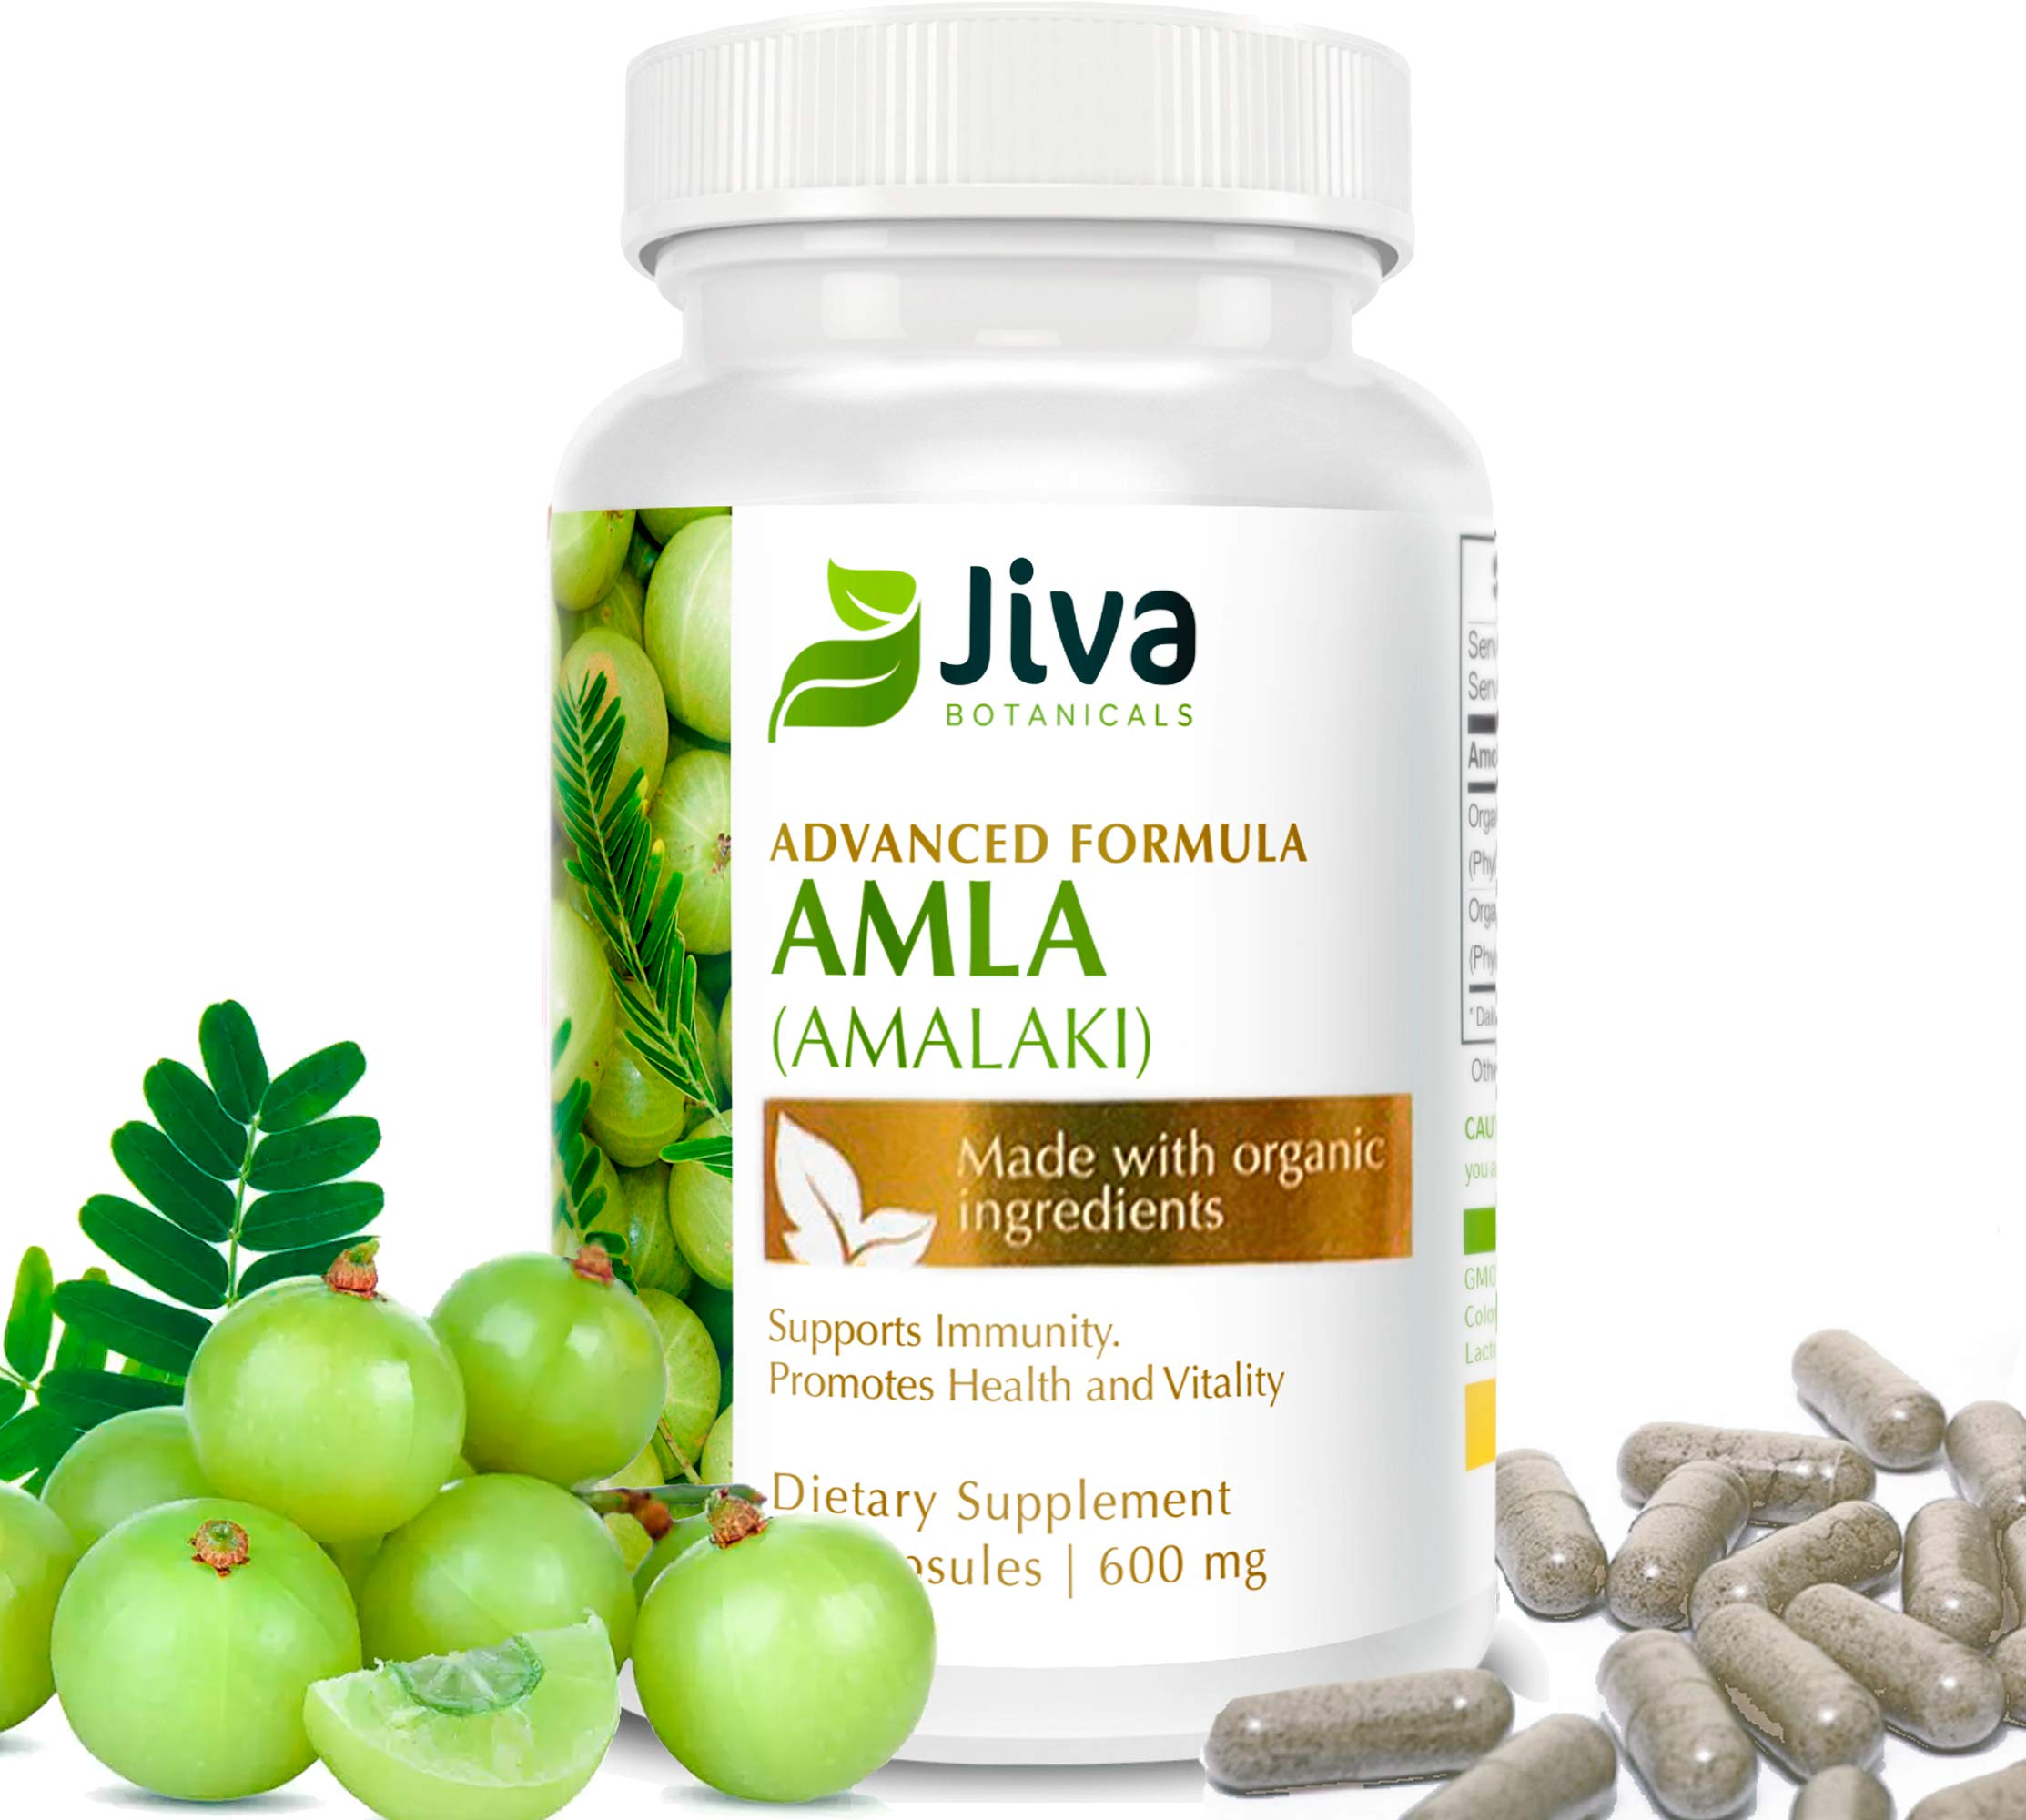 Organic Amla Powder Capsules - 600 mg Extract Formula - Potent Antioxidant, High in Organic Vitamin C - Amalaki, by JIVA BOTANICALS